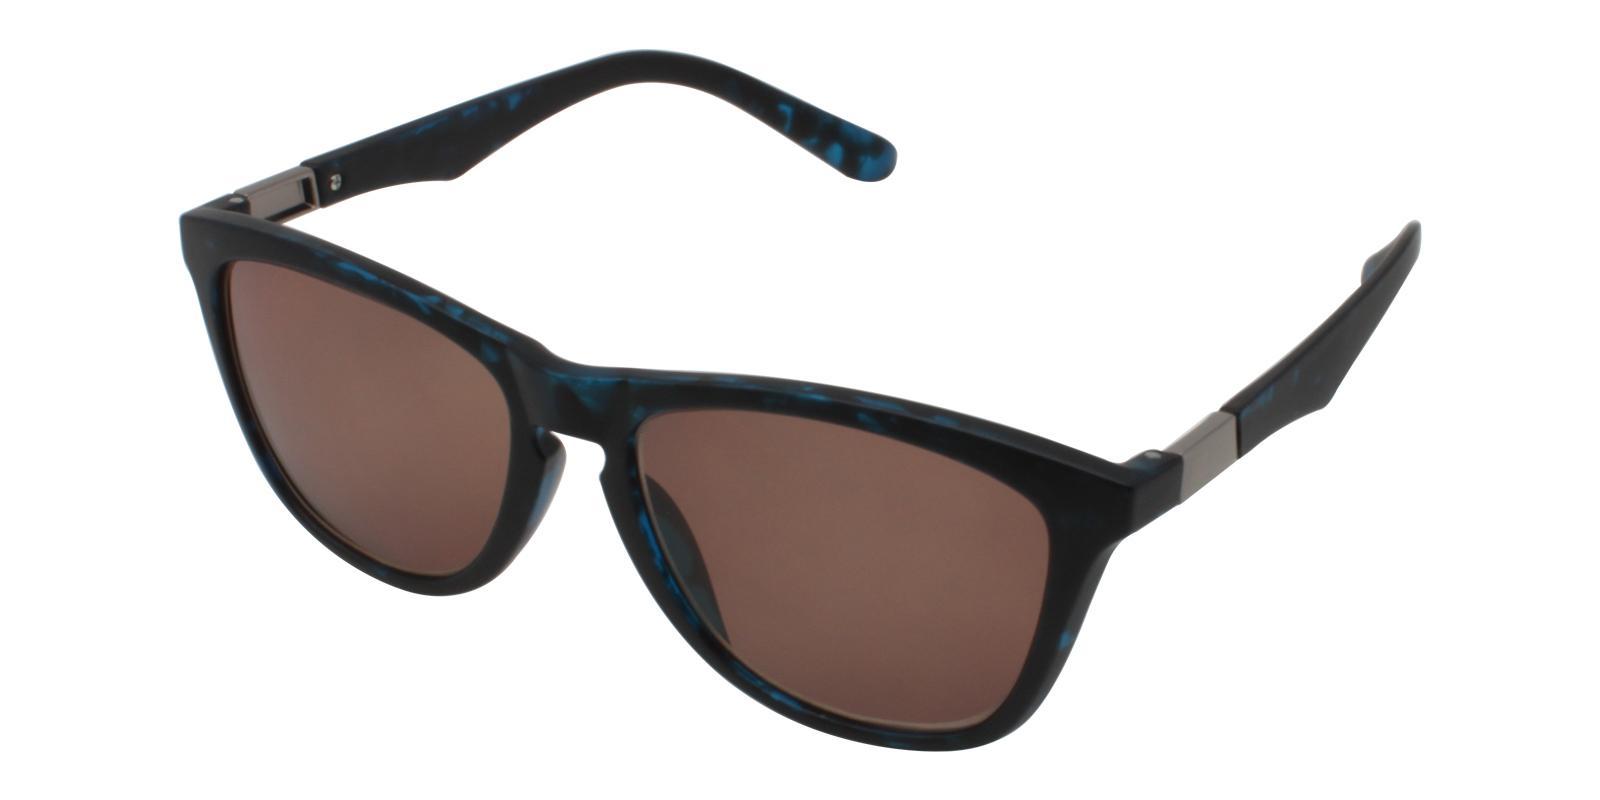 Bentleyville Pattern TR Sunglasses , UniversalBridgeFit Frames from ABBE Glasses